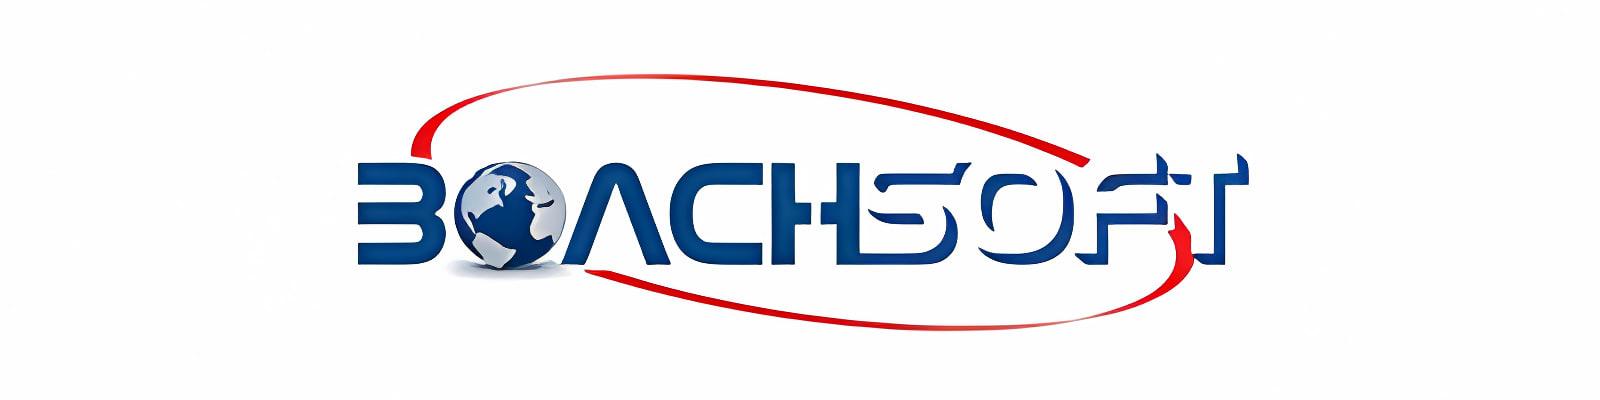 Boachsoft Finance